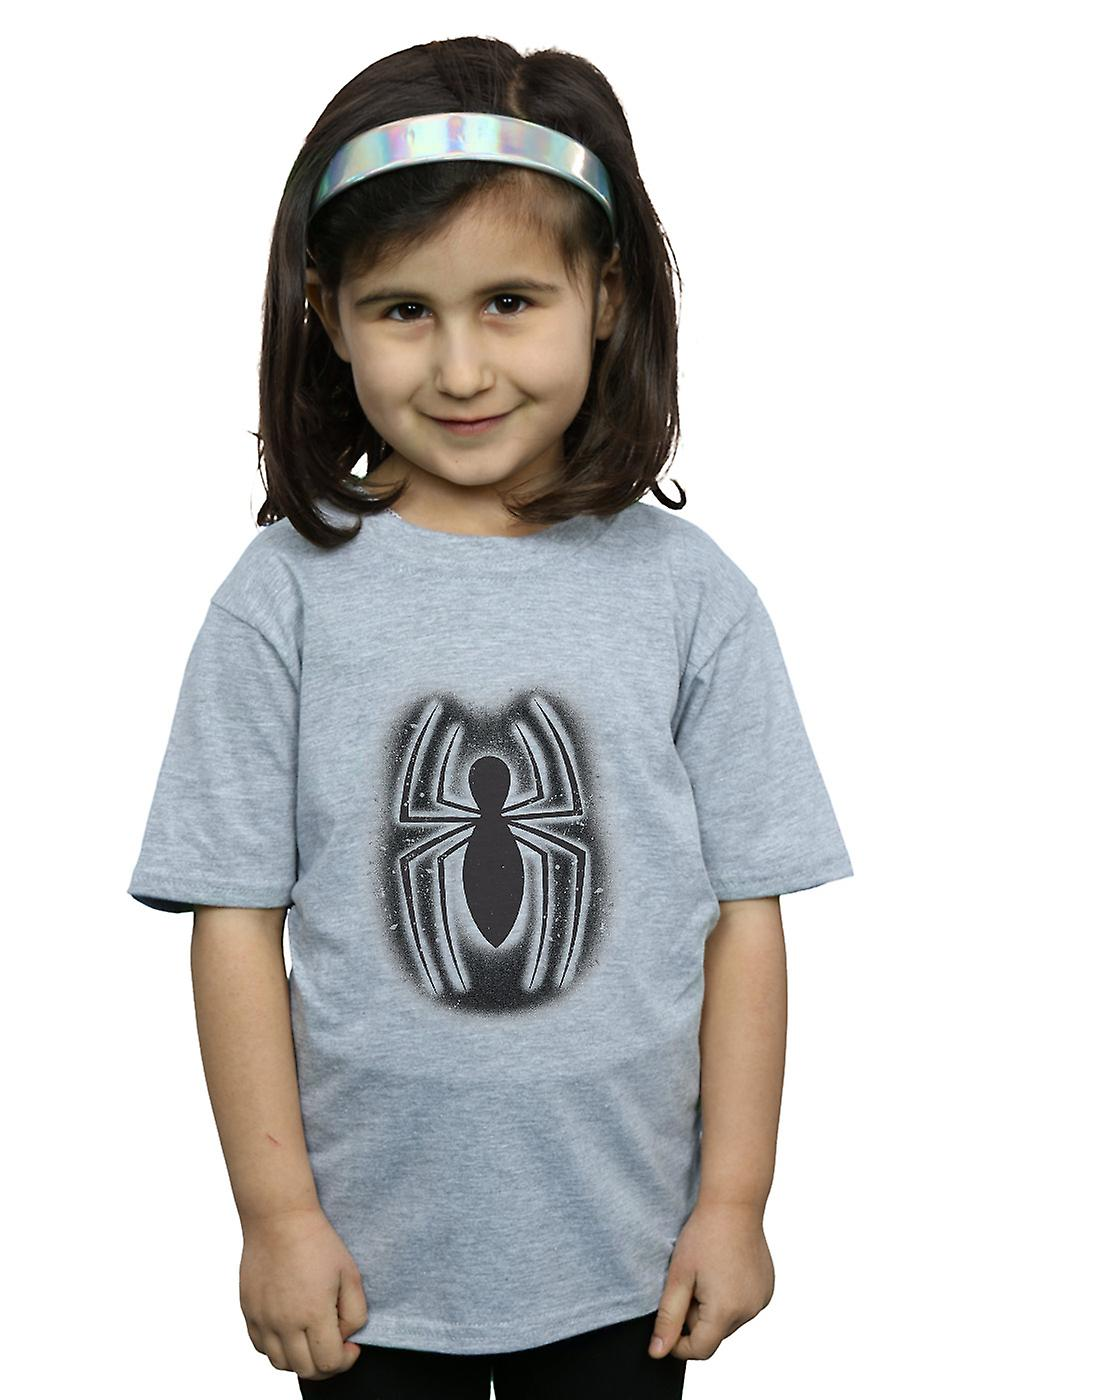 Ragazze Marvel Spider-Man Graffiti t-shirt